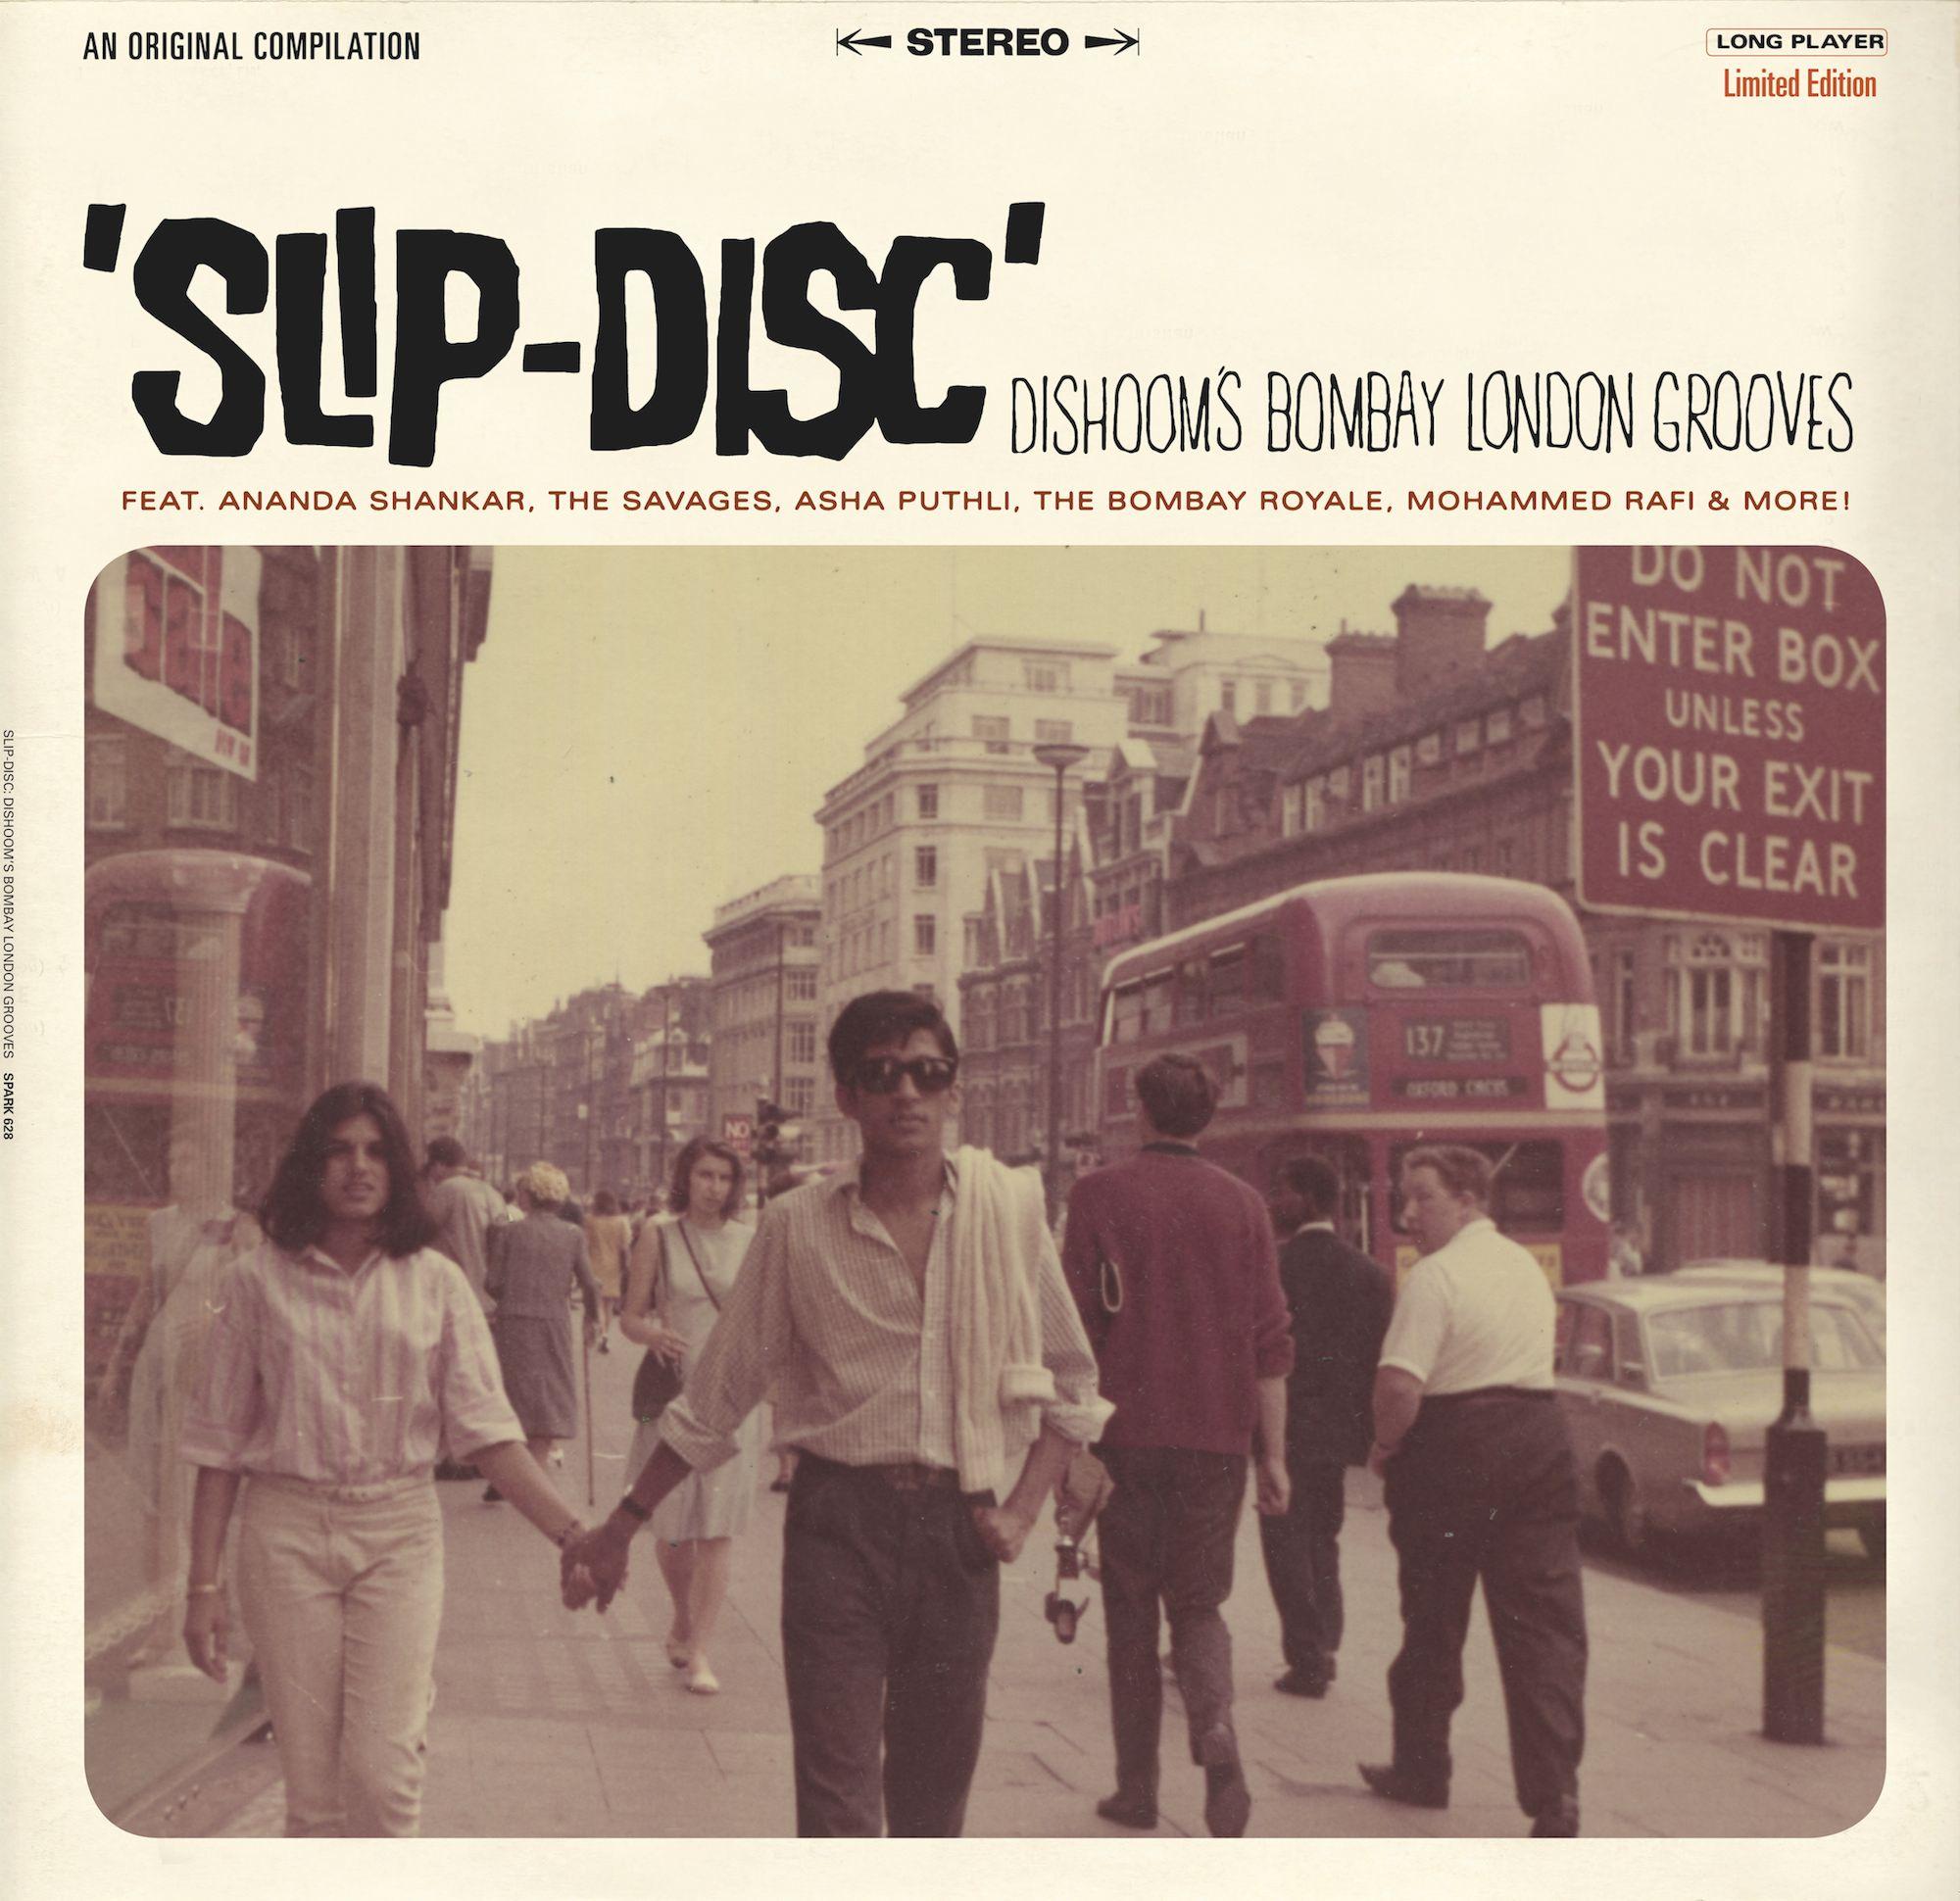 Slip_Disc_LP_Cover_AW_final copy 2.jpg